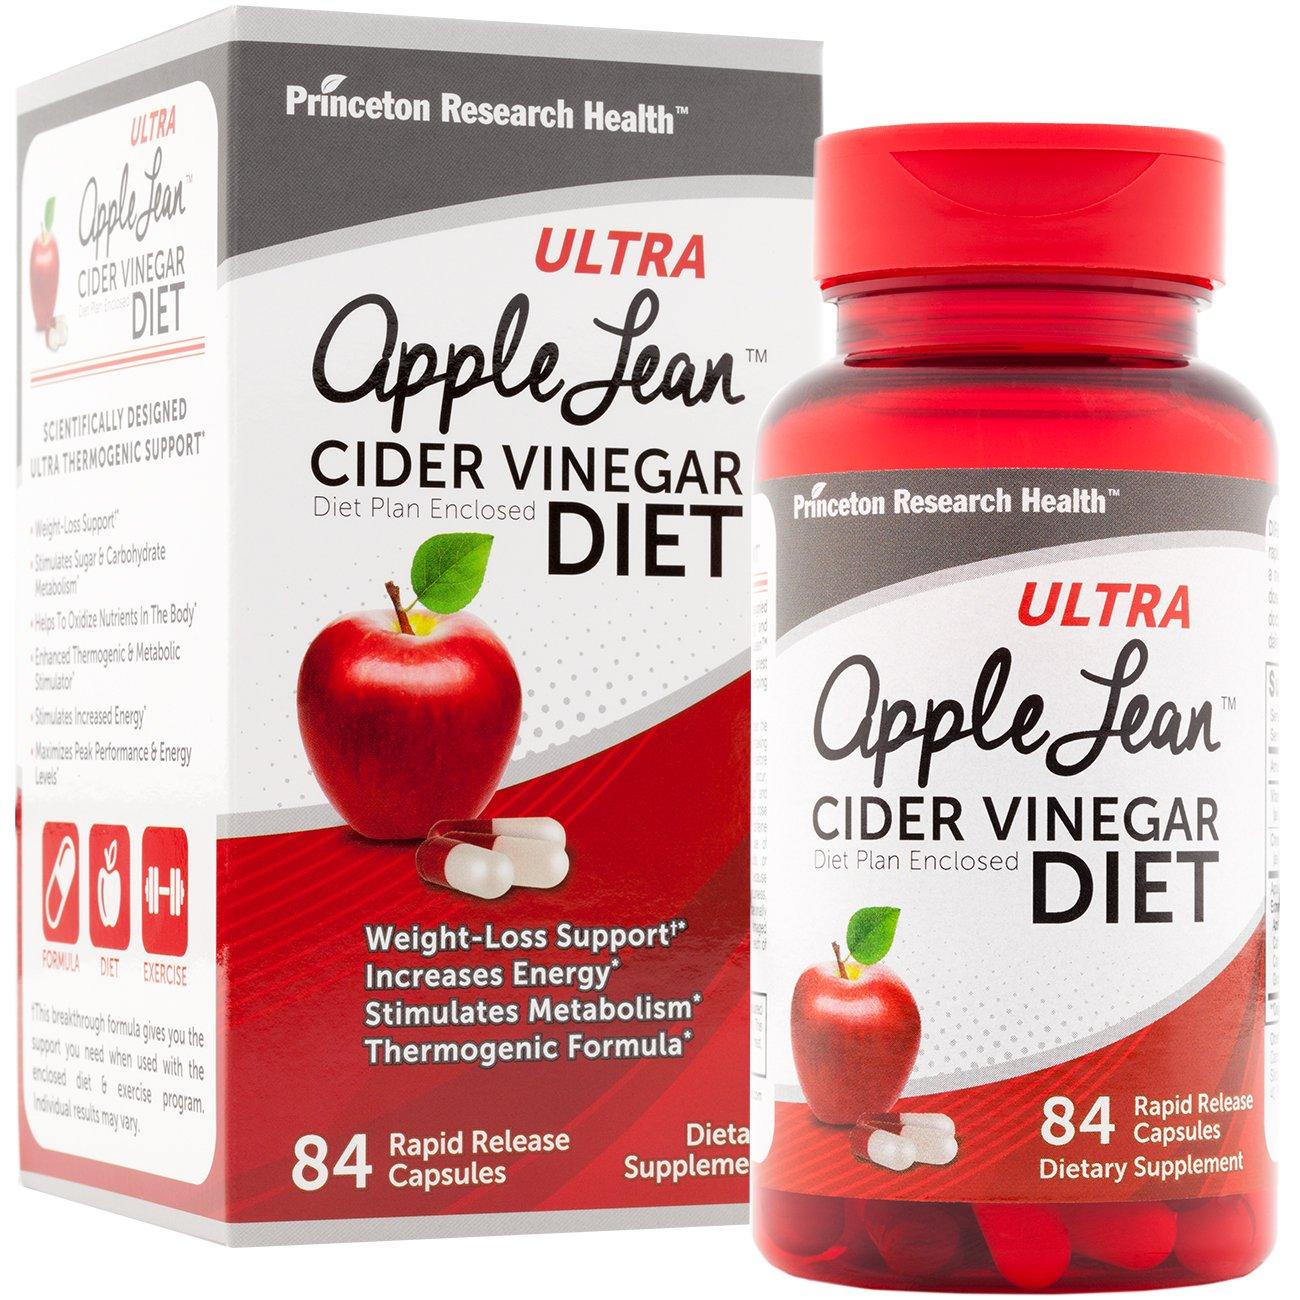 What is a Safe Daily Dosage of Apple Cider Vinegar (ACV)?